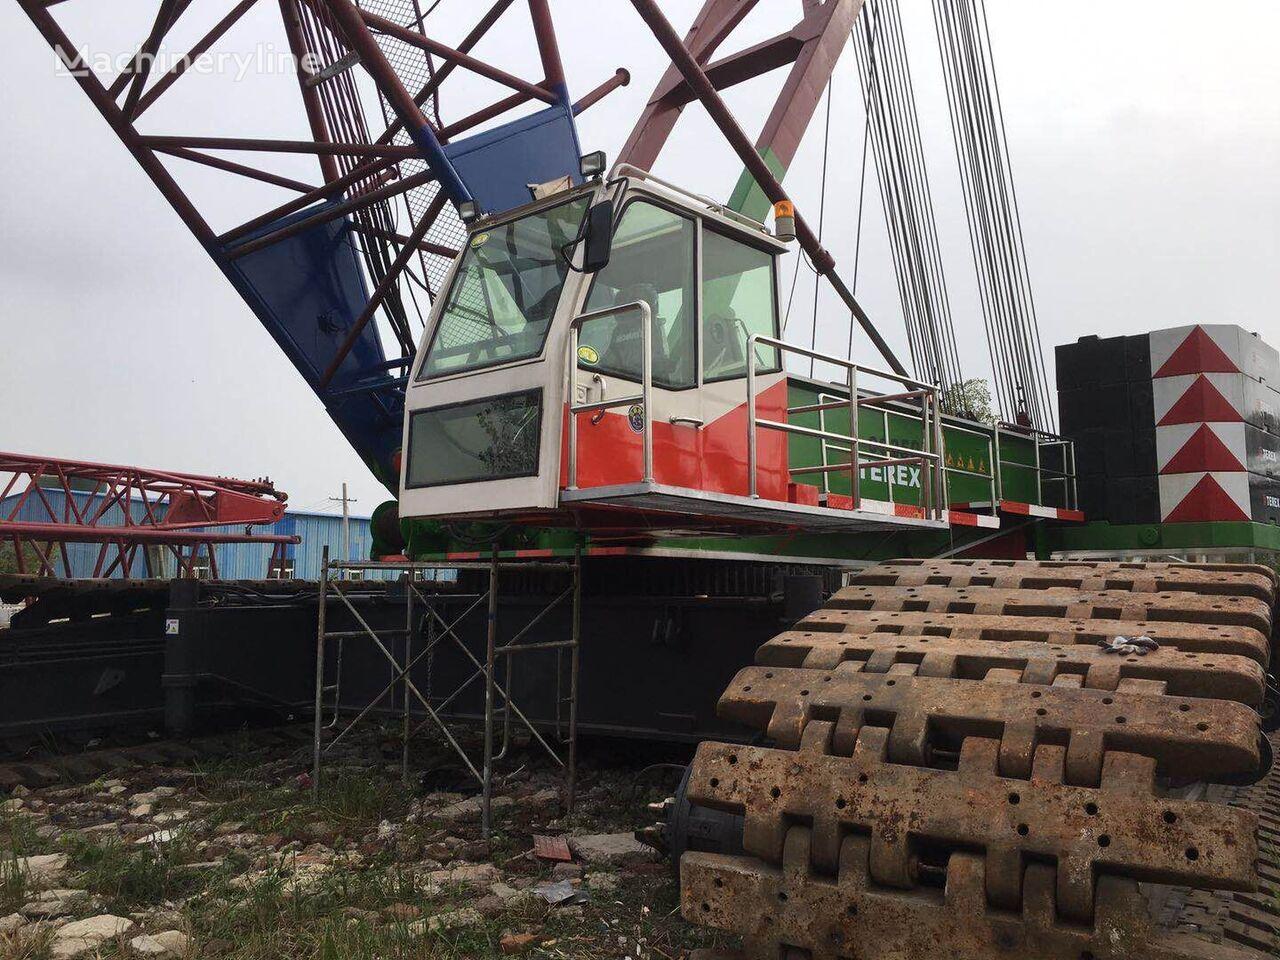 TEREX cc2500 crawler crane